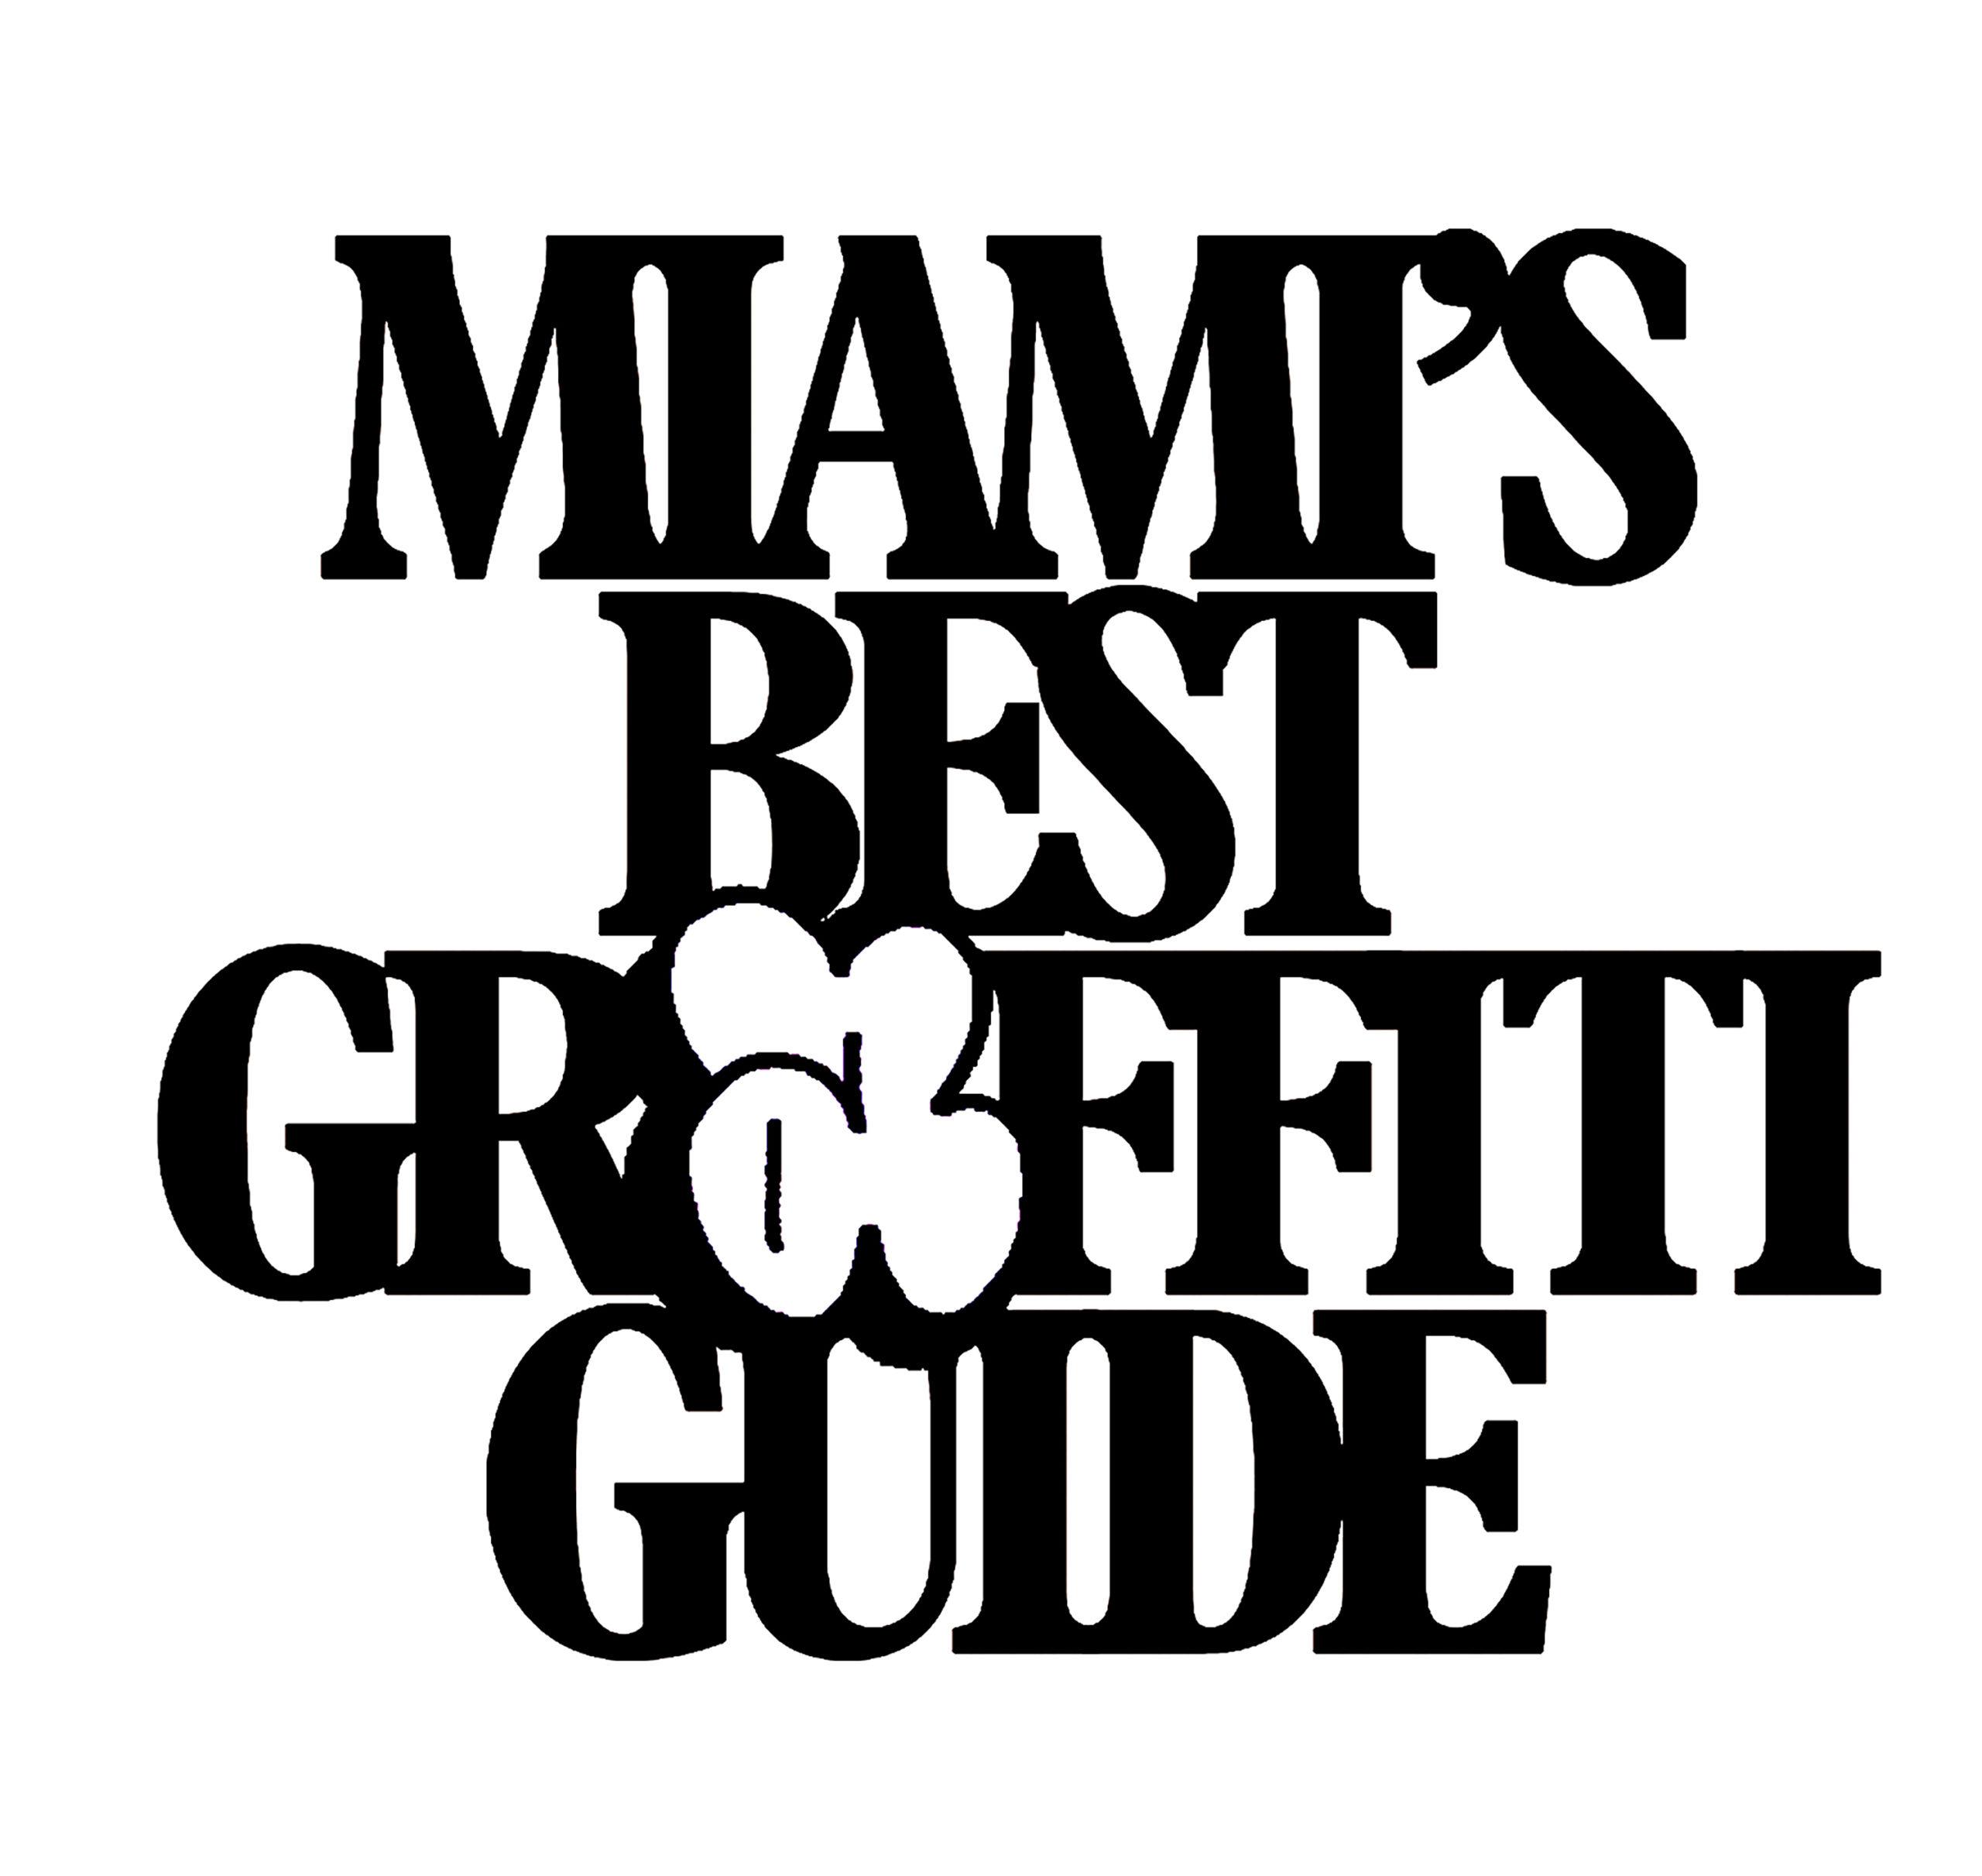 Miamis best graffiti guide logo